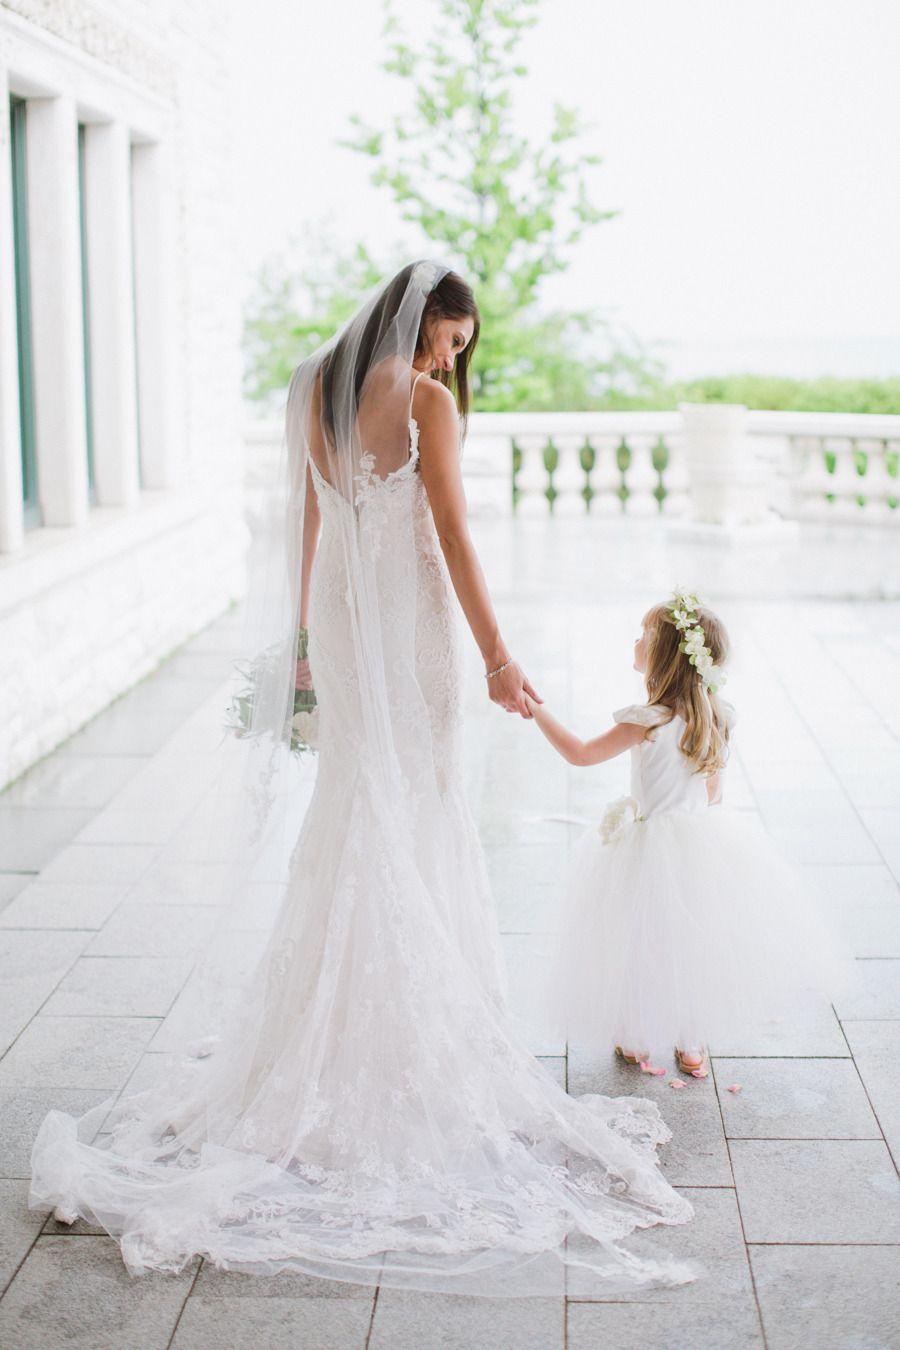 Mother dresses for sons wedding  Loyola University Wedding from Kina Wicks Photography  Wedding